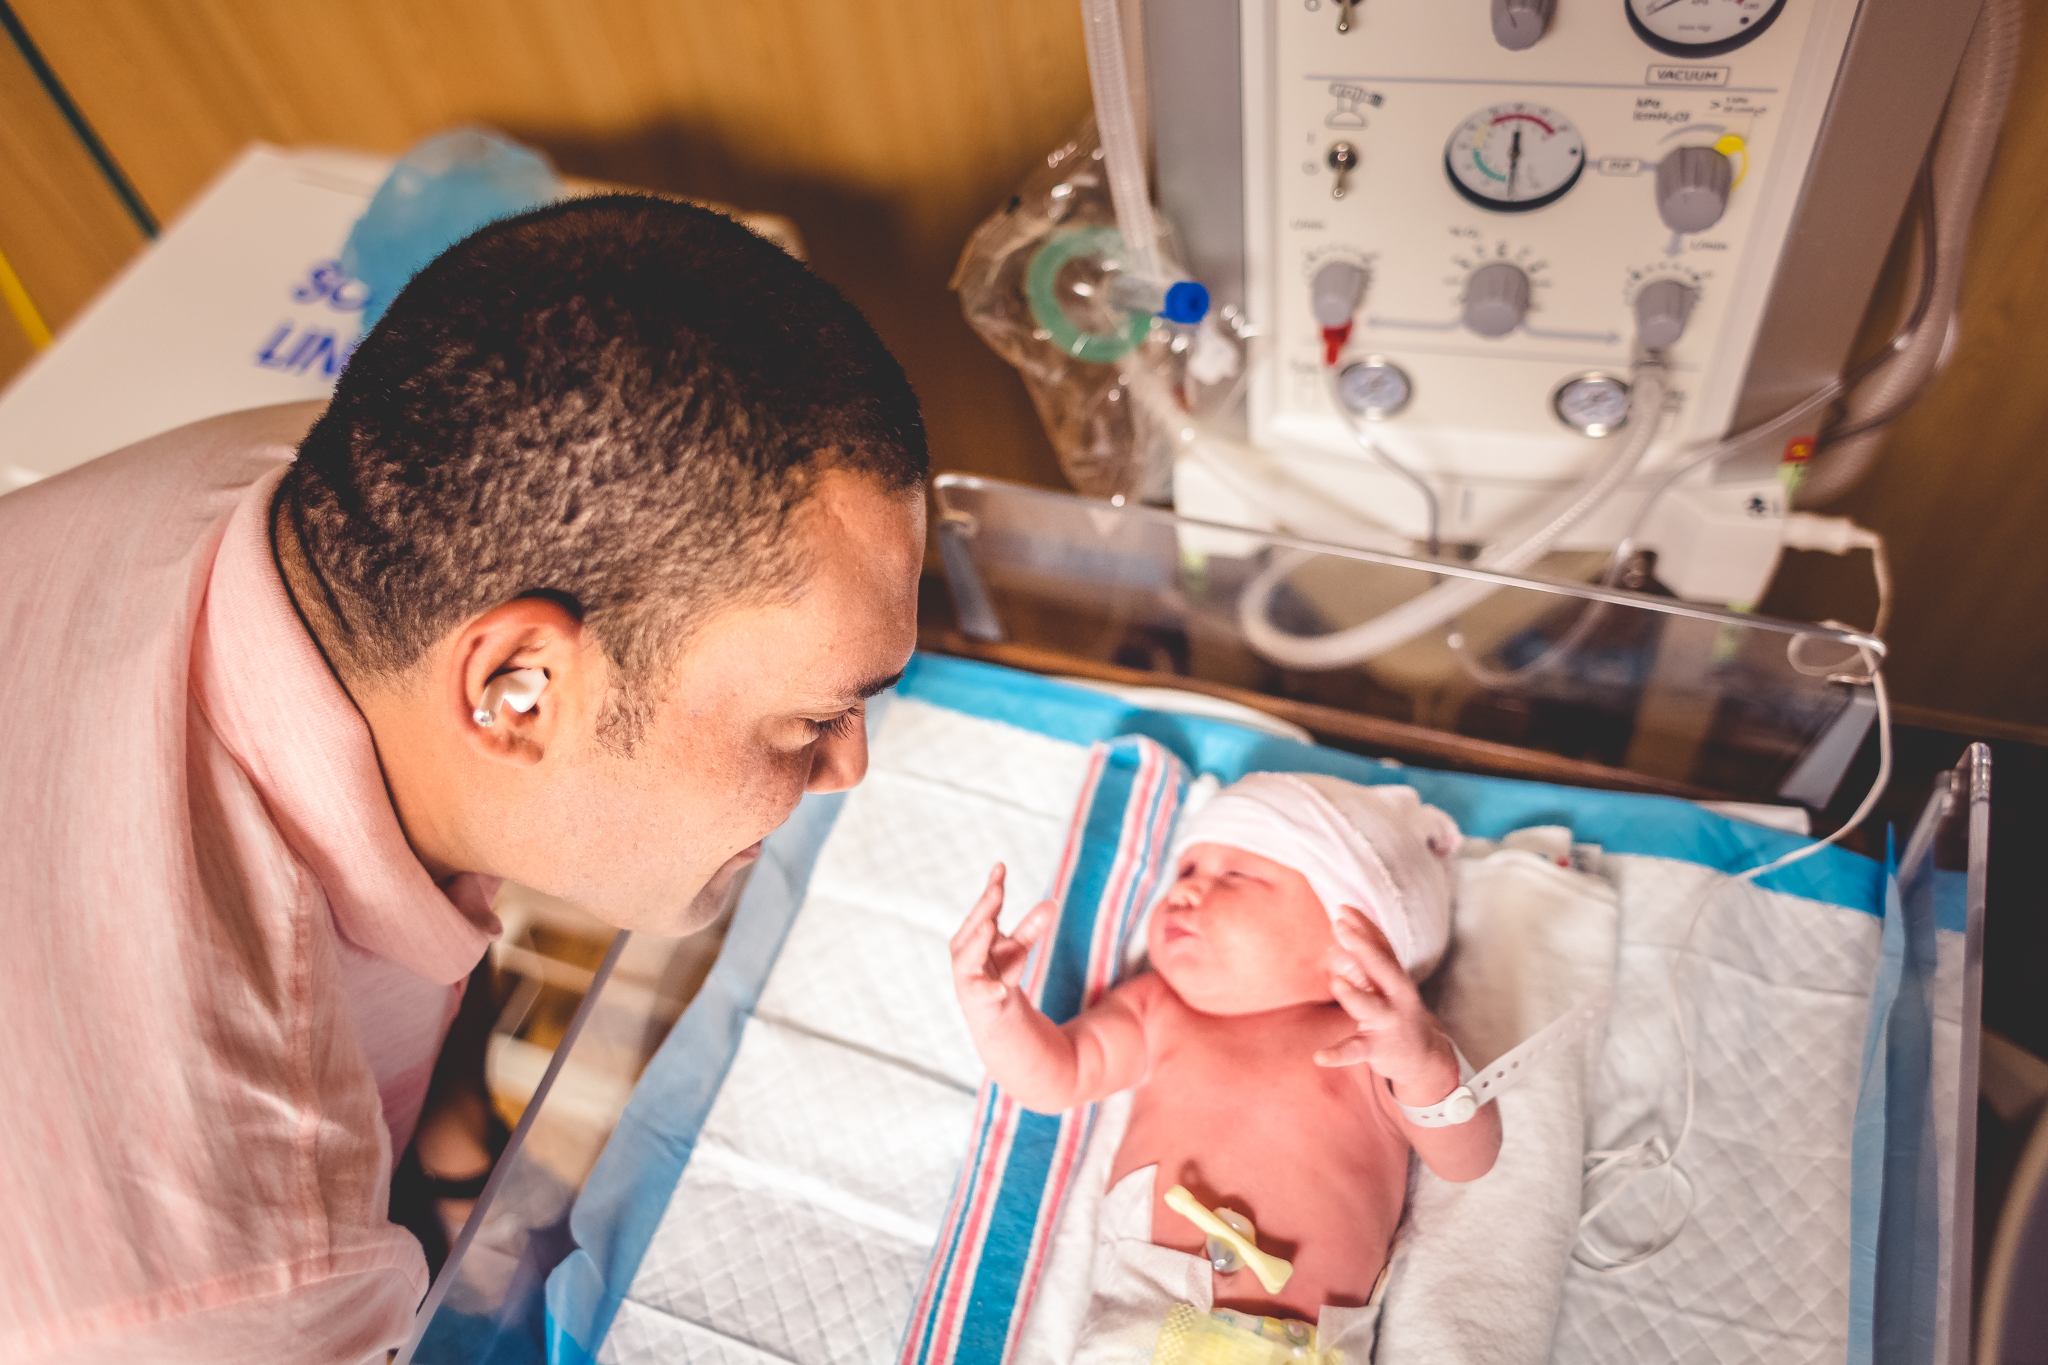 gentle cesarean birth photography and birth videography birth videographer boca raton florida-7.jpg